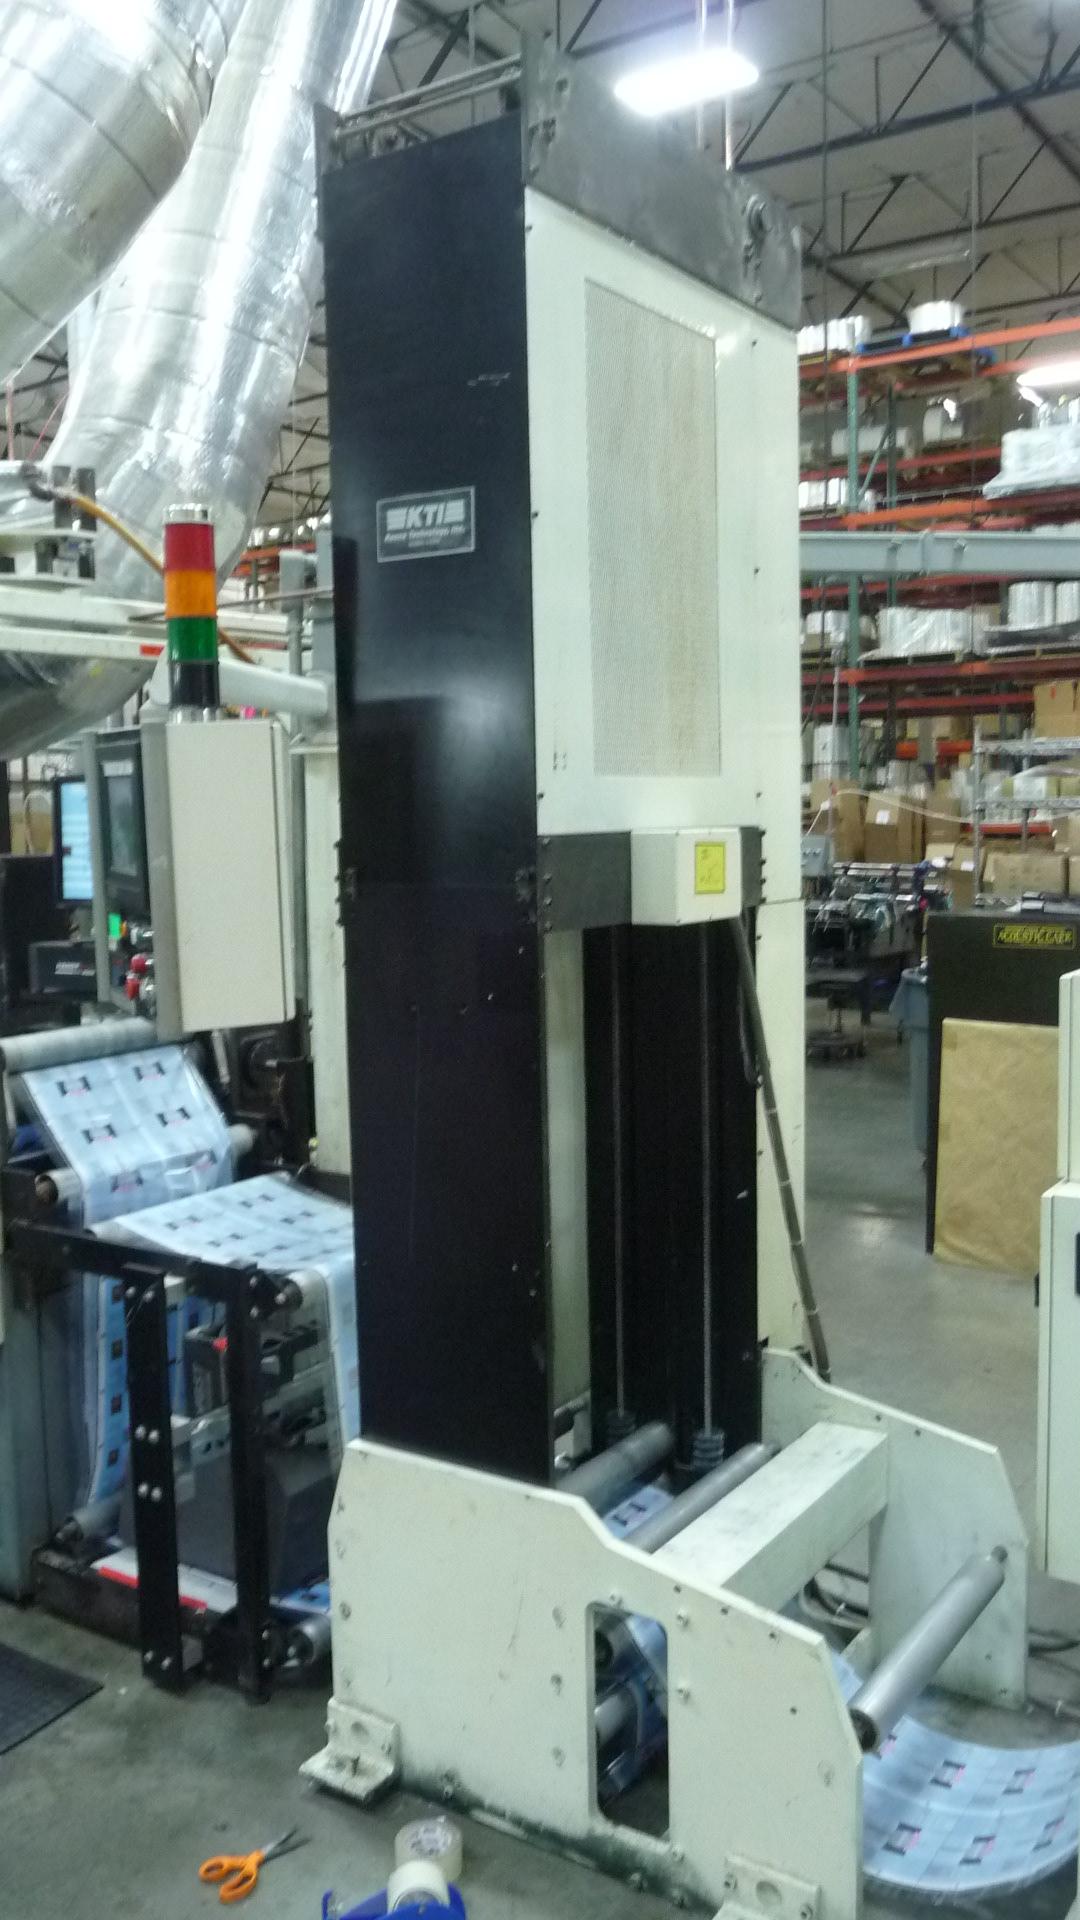 Comco Proglide MSP - Used Flexo Printing Presses and Used Flexographic Equipment-1